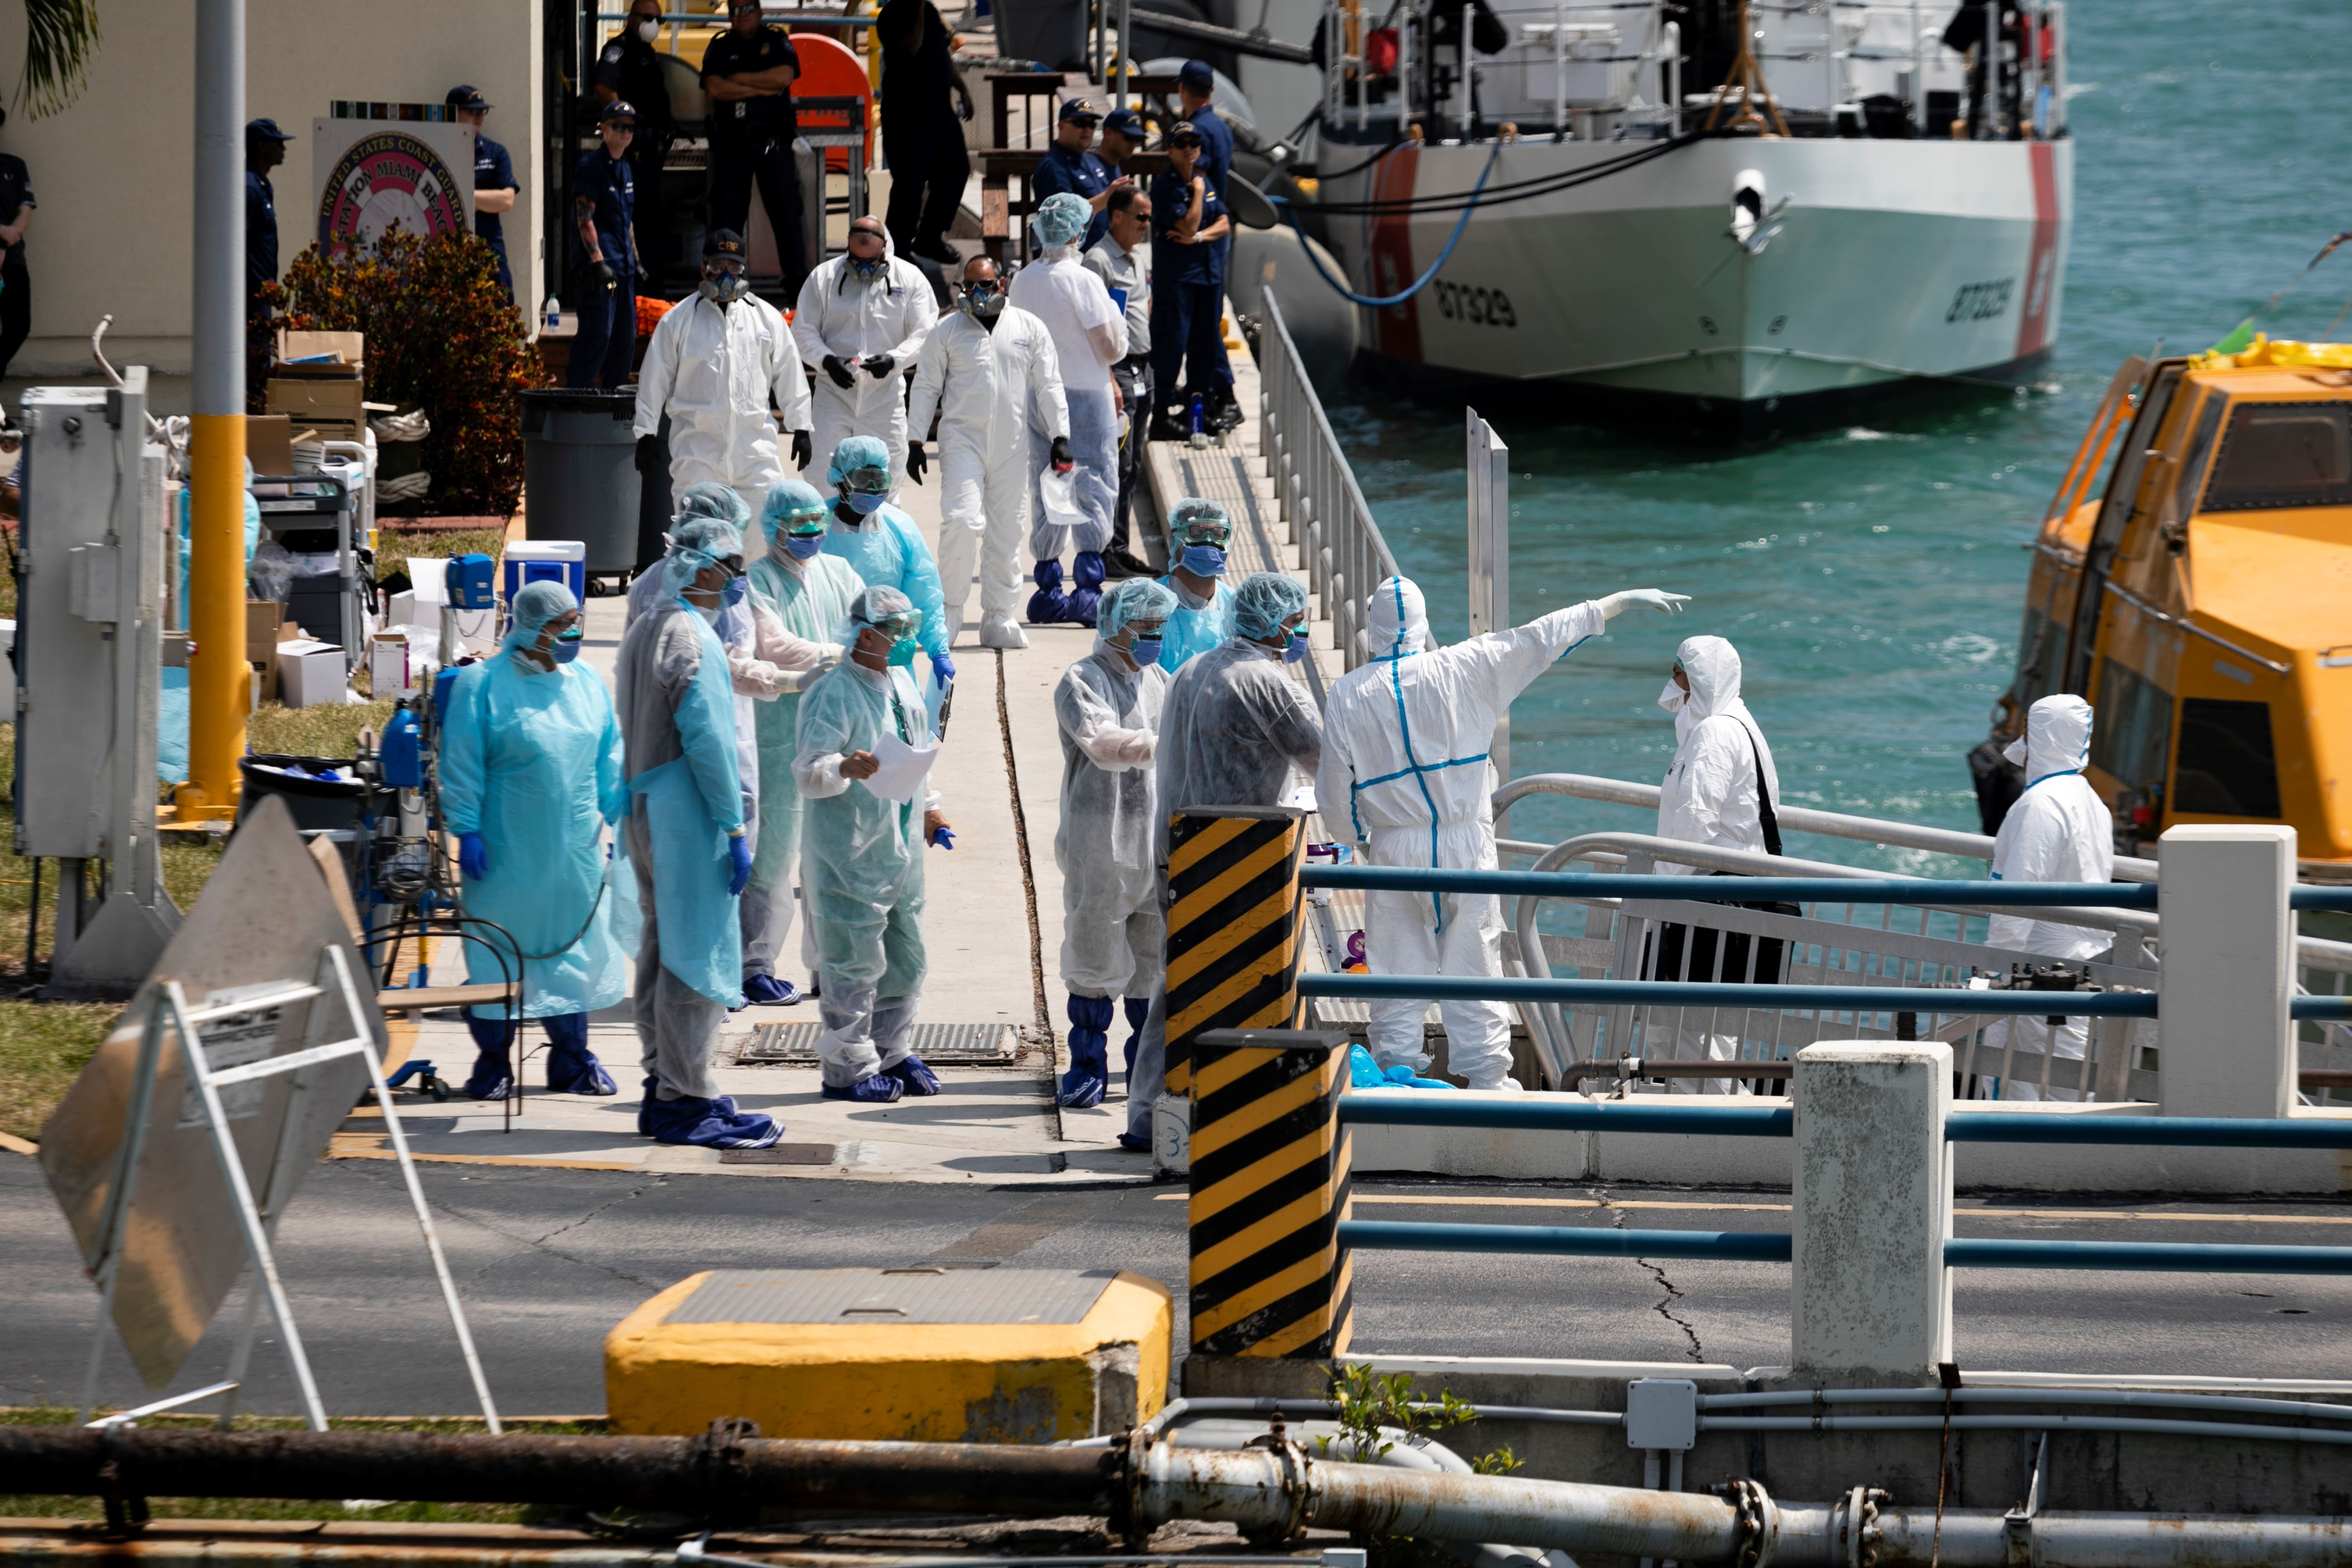 Co Down couple on-board coronavirus-stricken cruise ship tell of 'nightmare'